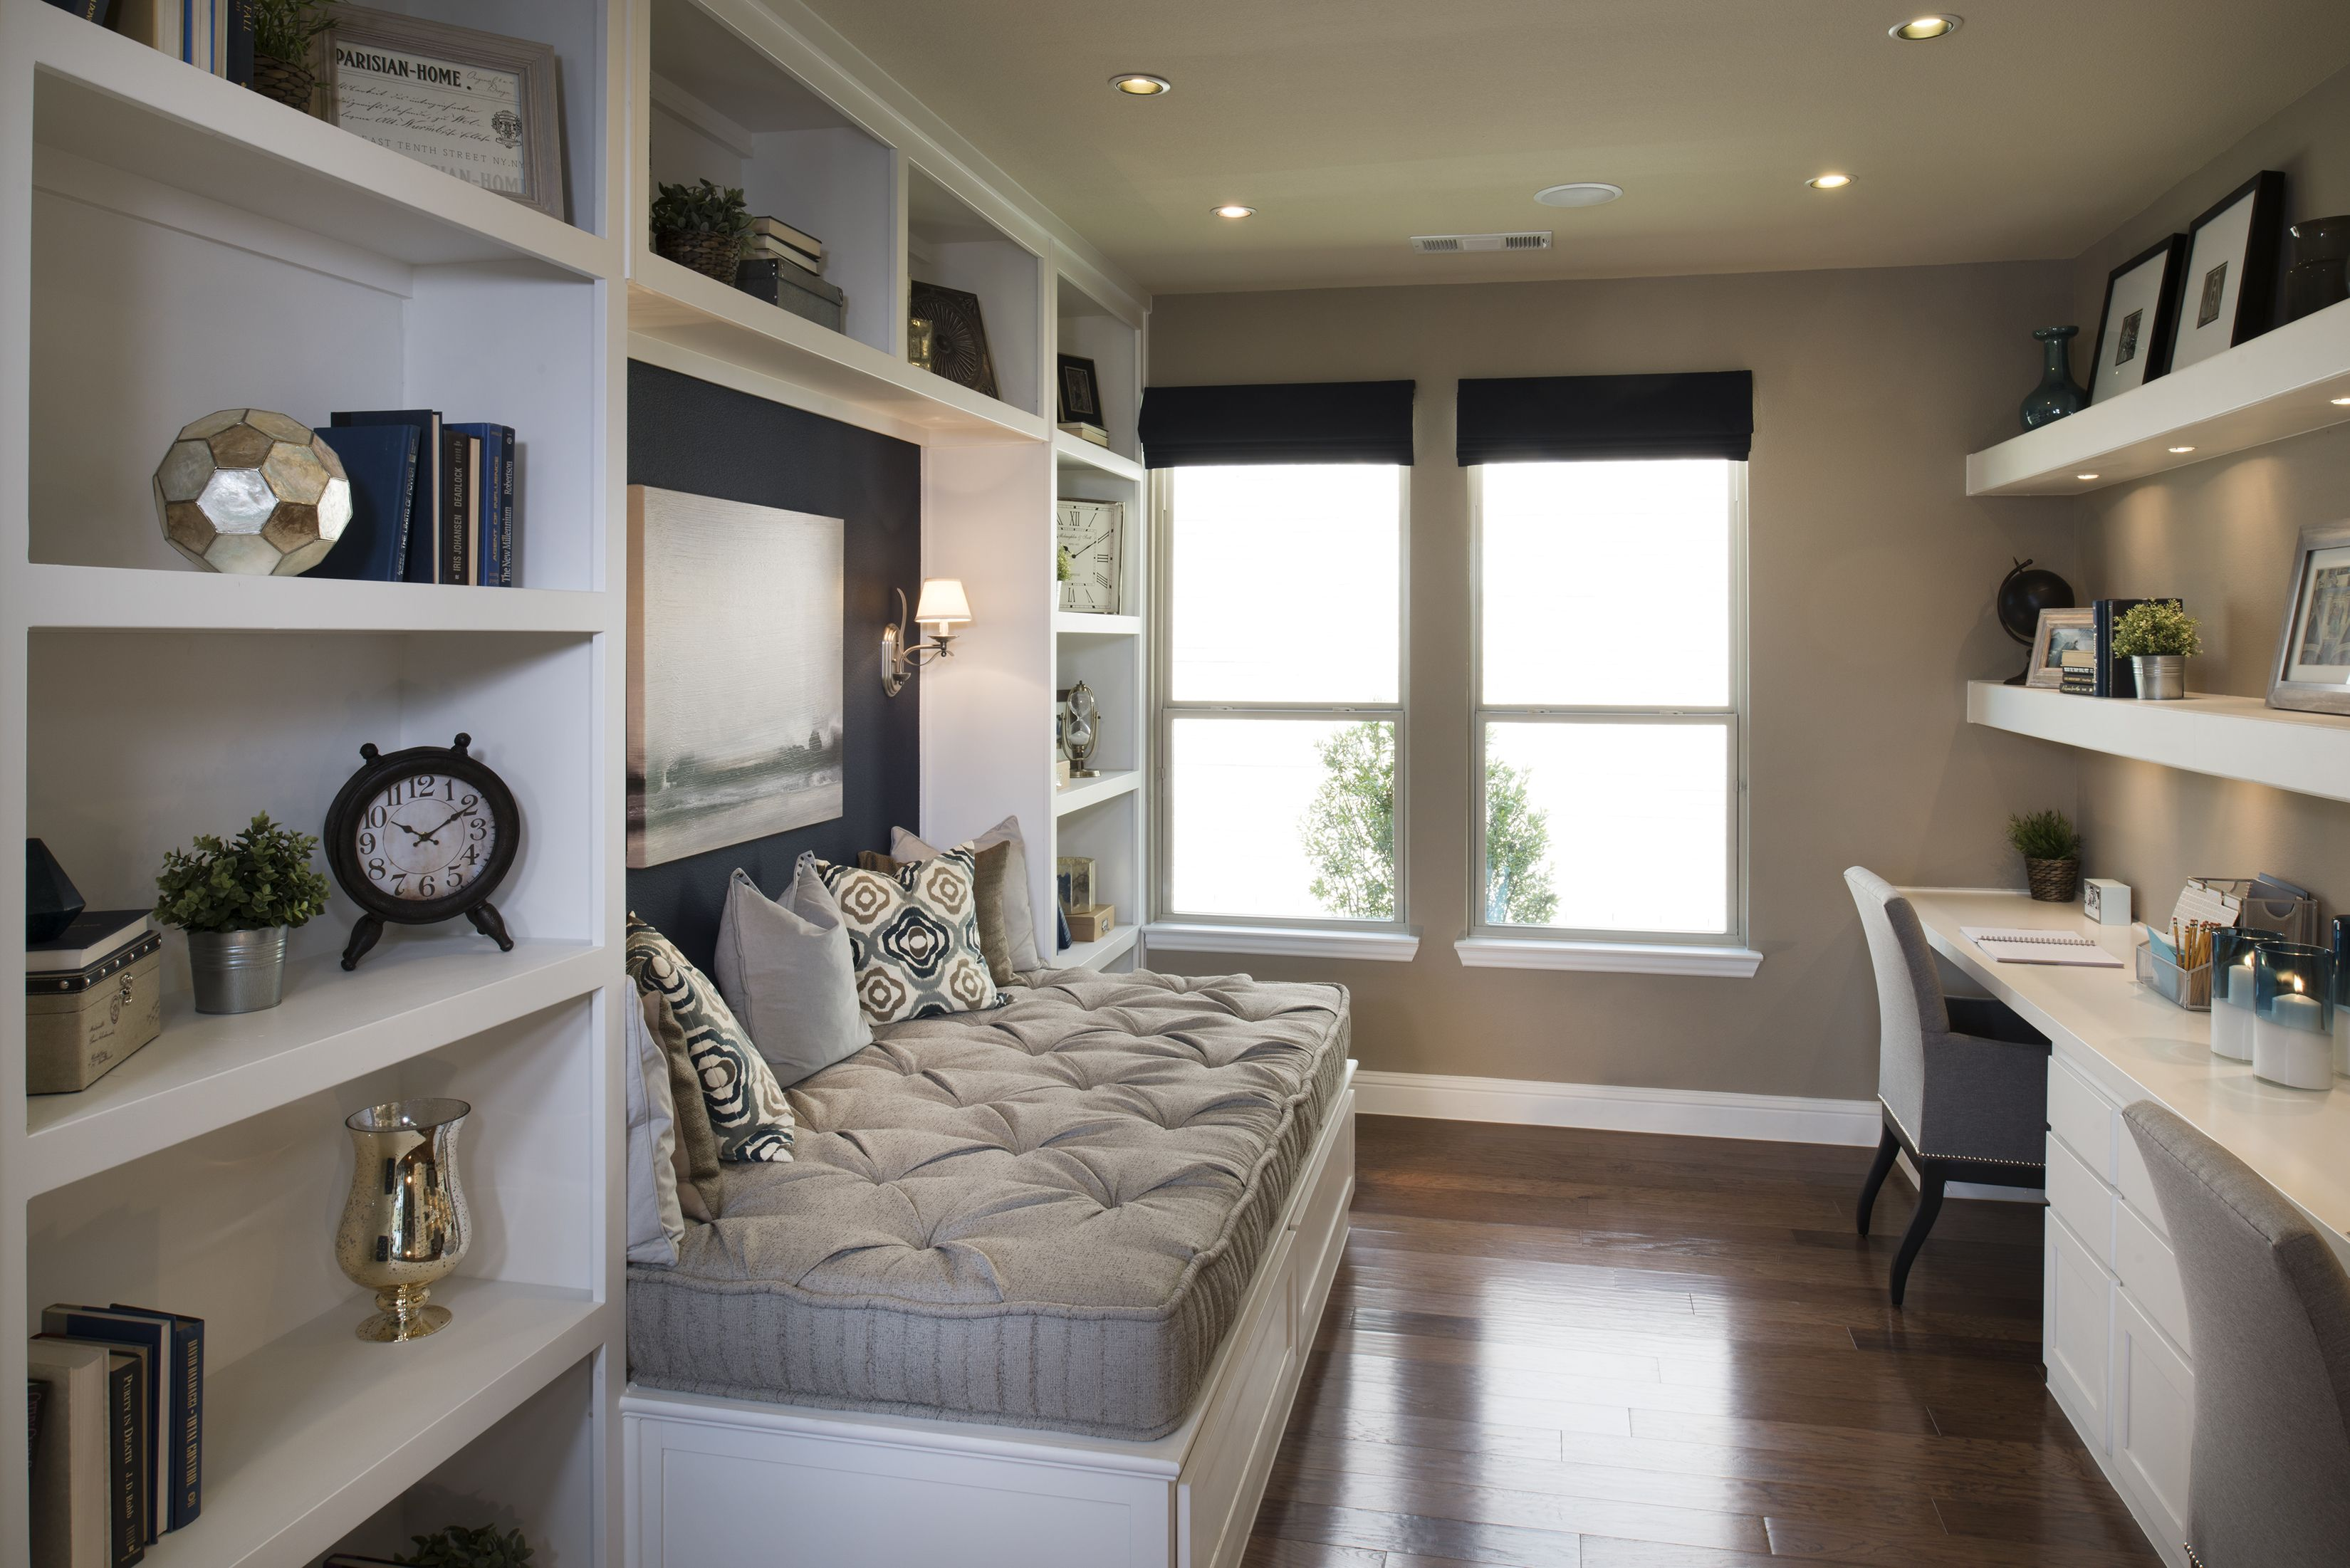 Inspiring Spaces Blog Guest bedroom office, Guest room